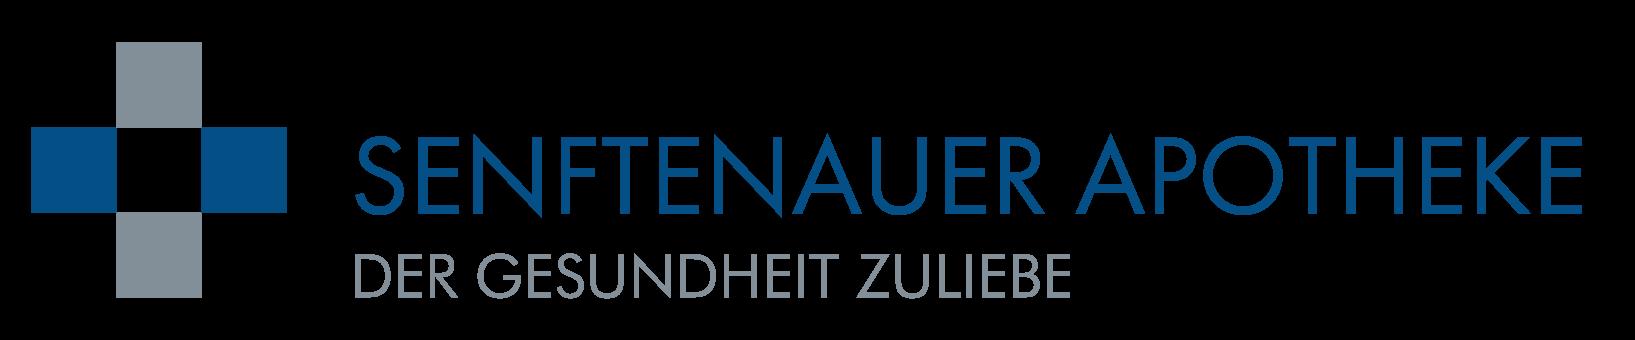 Logo der Senftenauer Apotheke